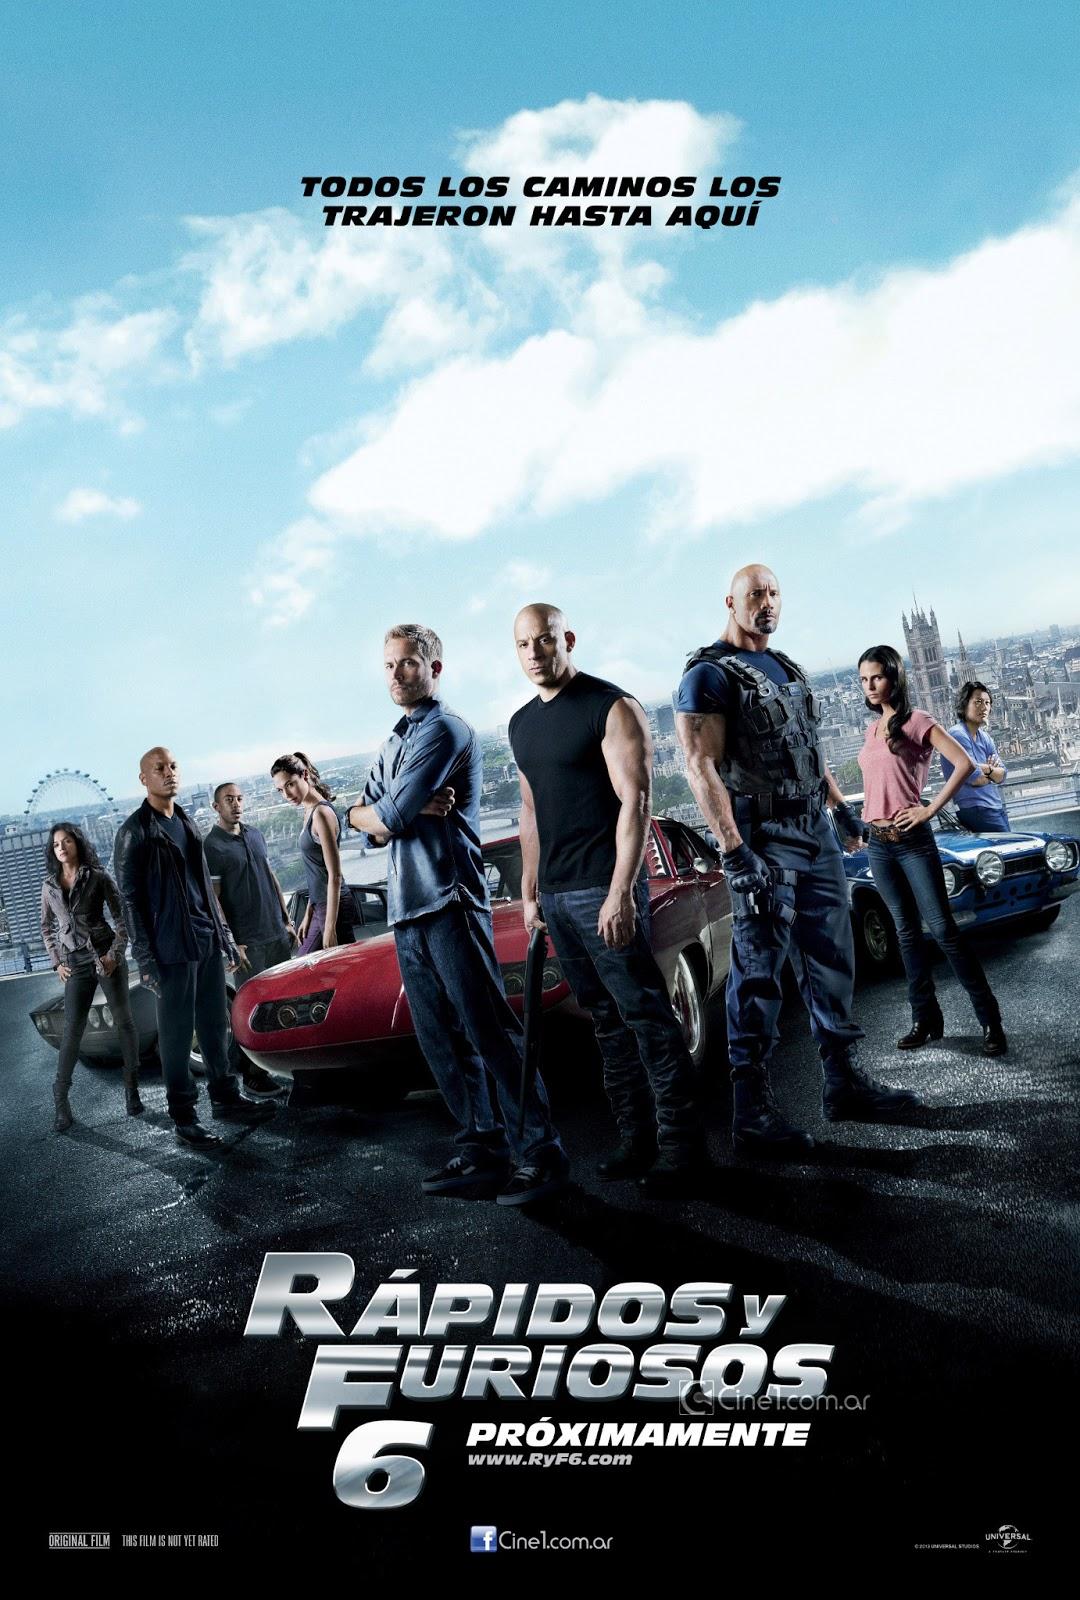 Category: Fast and Furious 6 , Rápidos y Furiosos 6